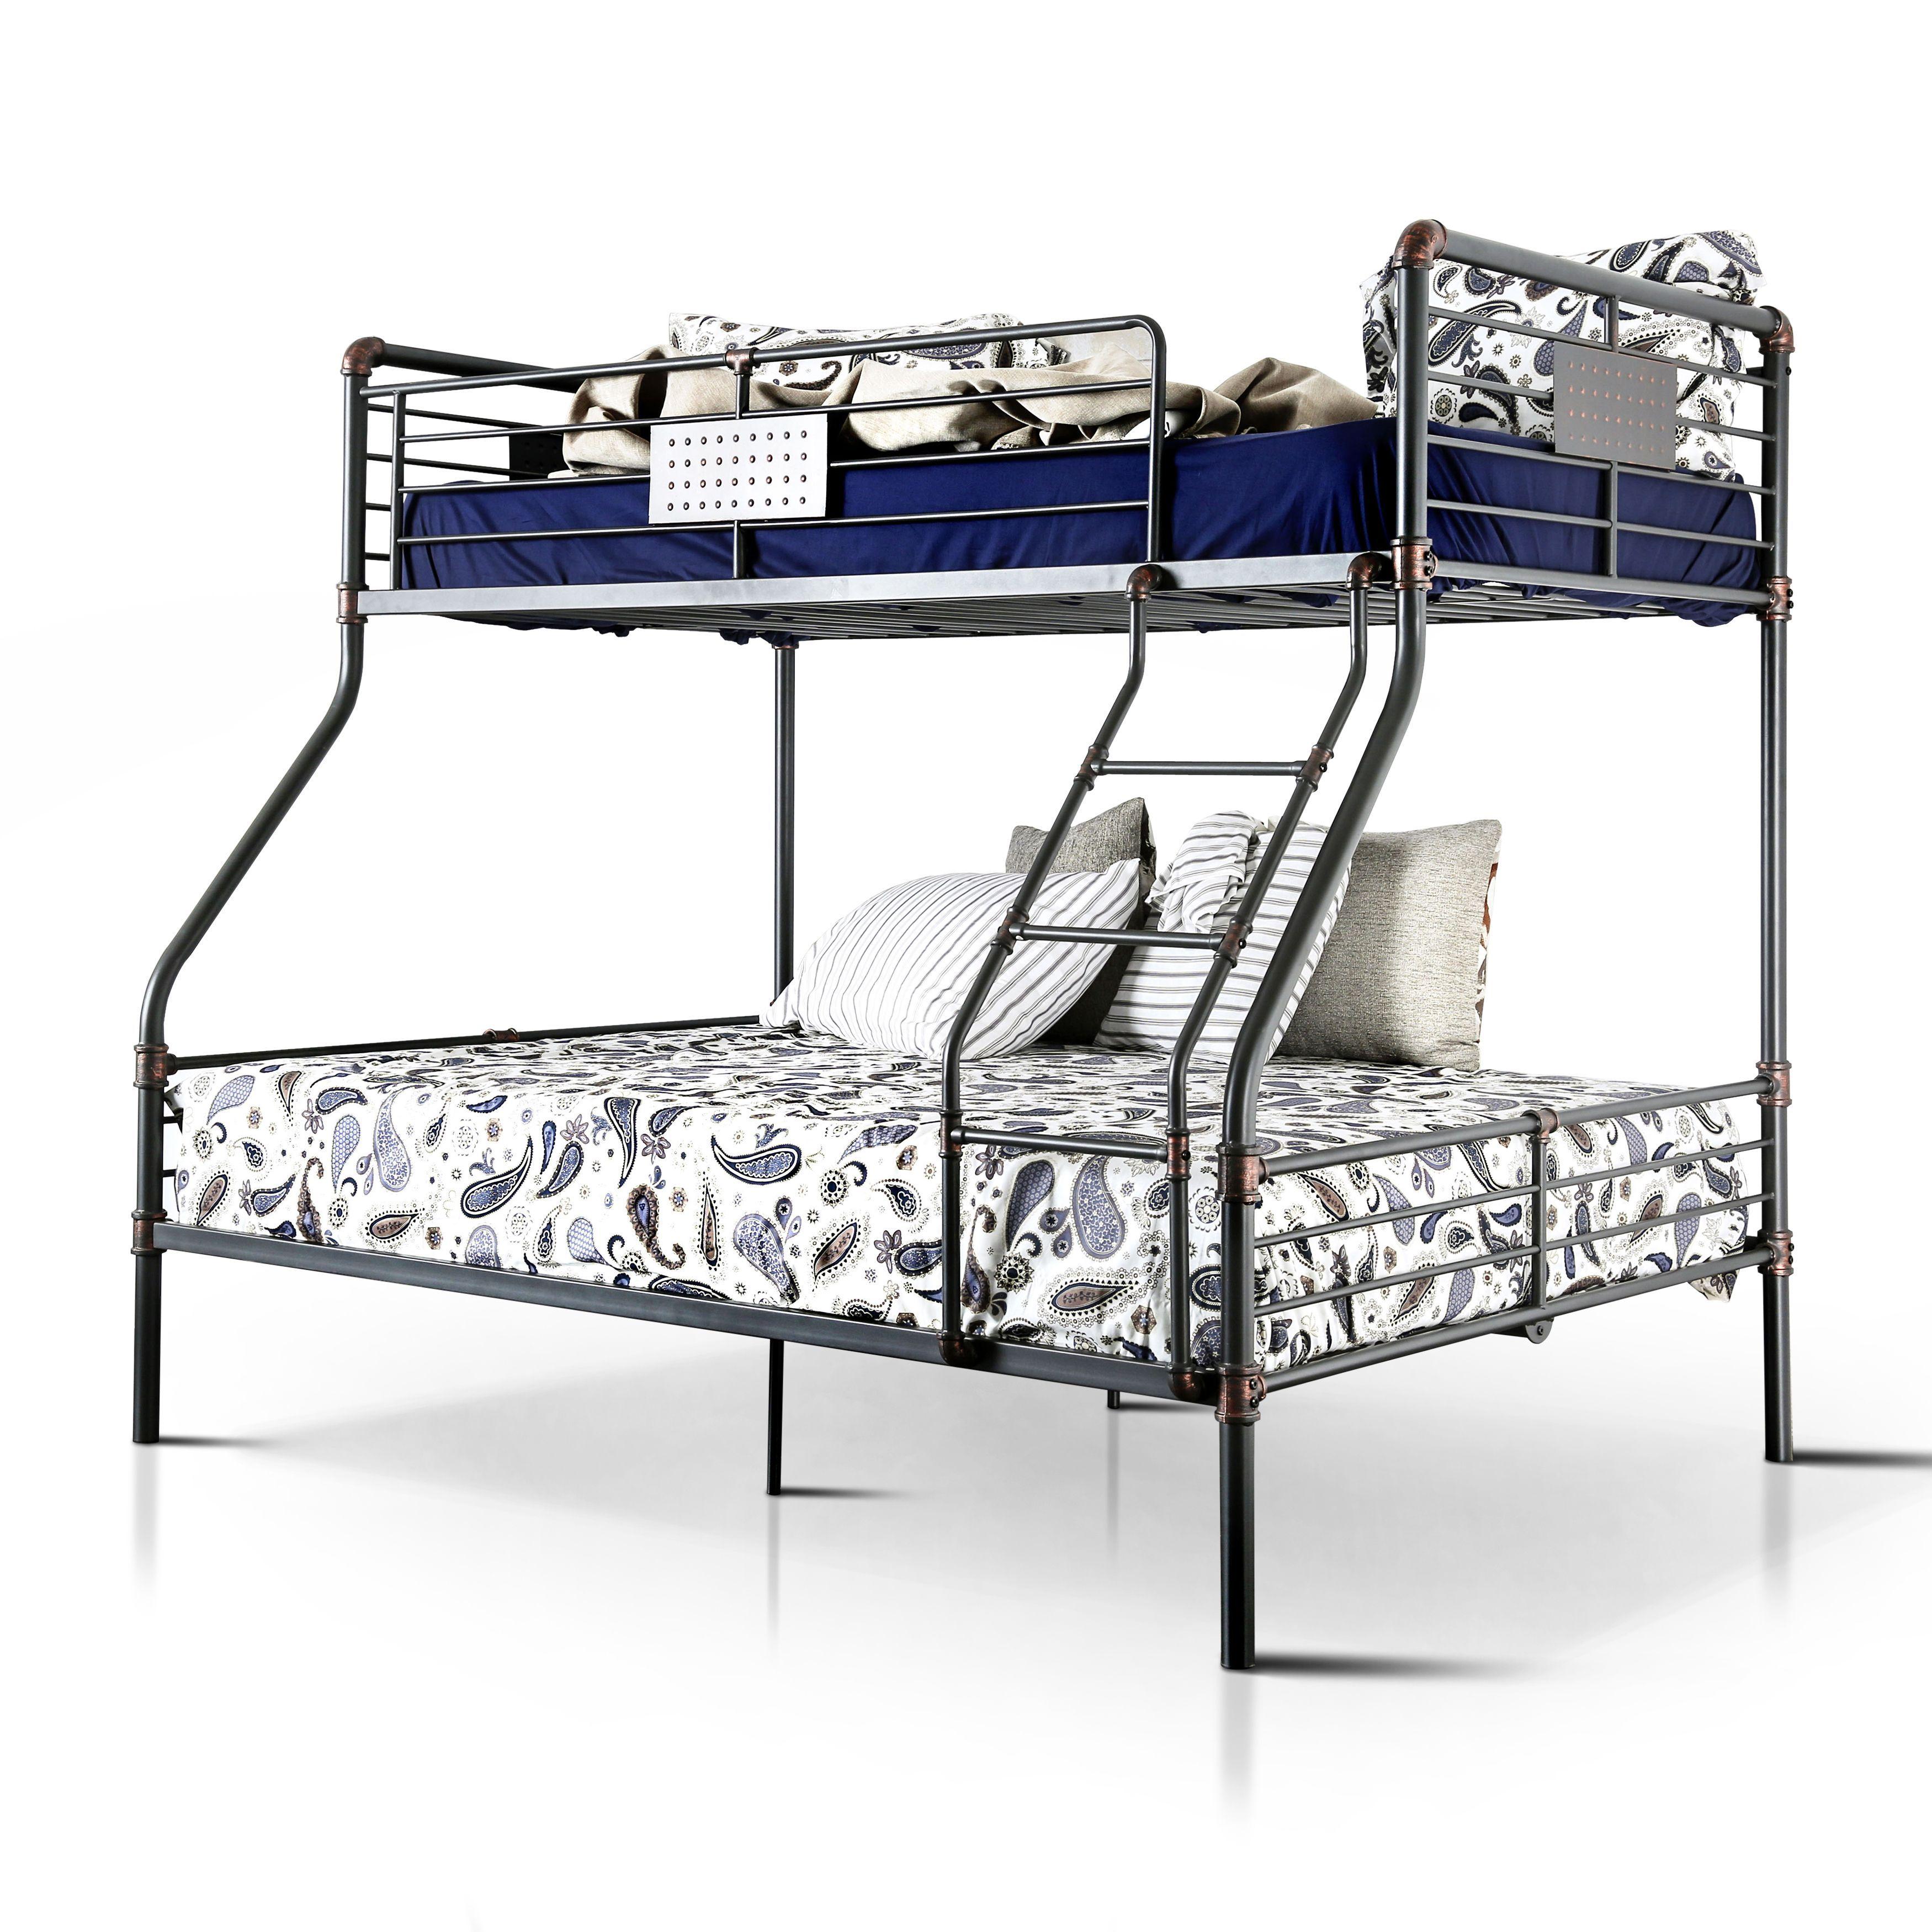 Loft bed with desk jordan's furniture  Furniture of America Herman Industrial Antique Black Twin over Full